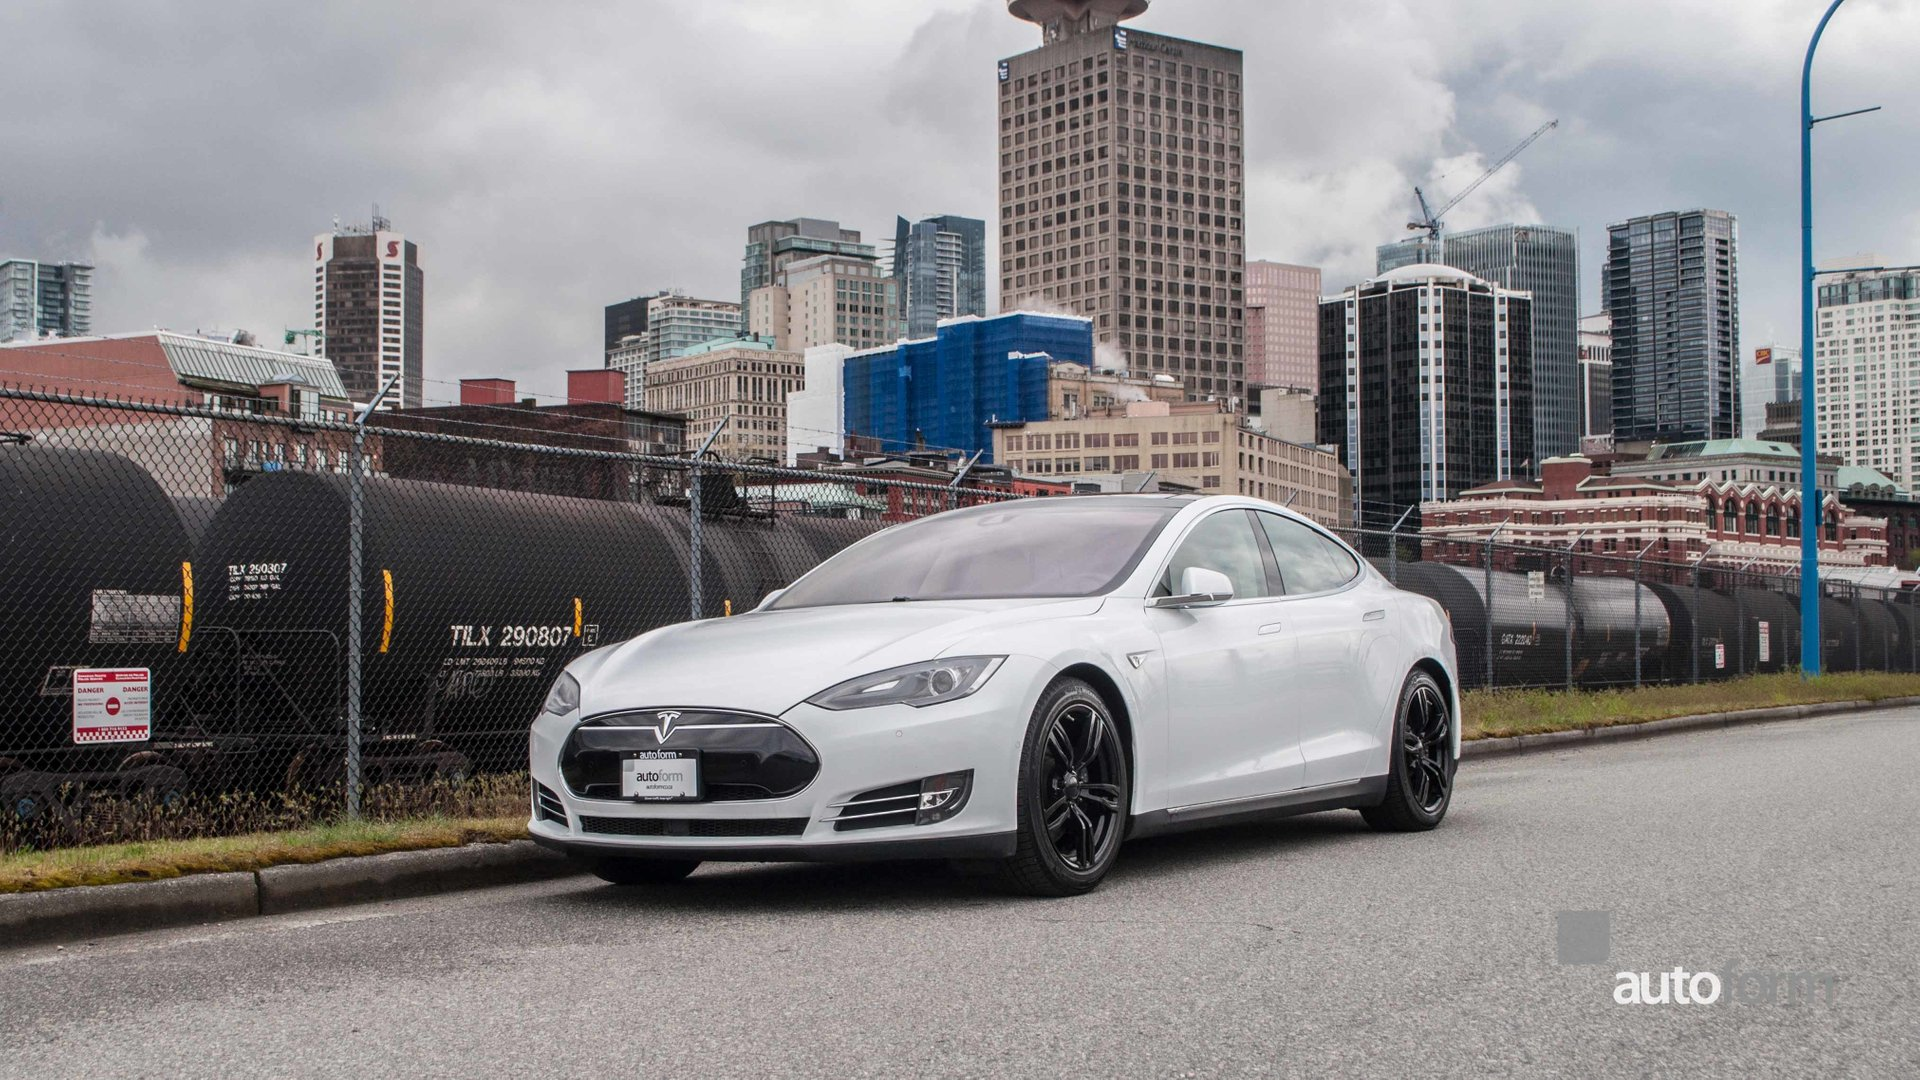 2015 tesla model s 60 w autopilot